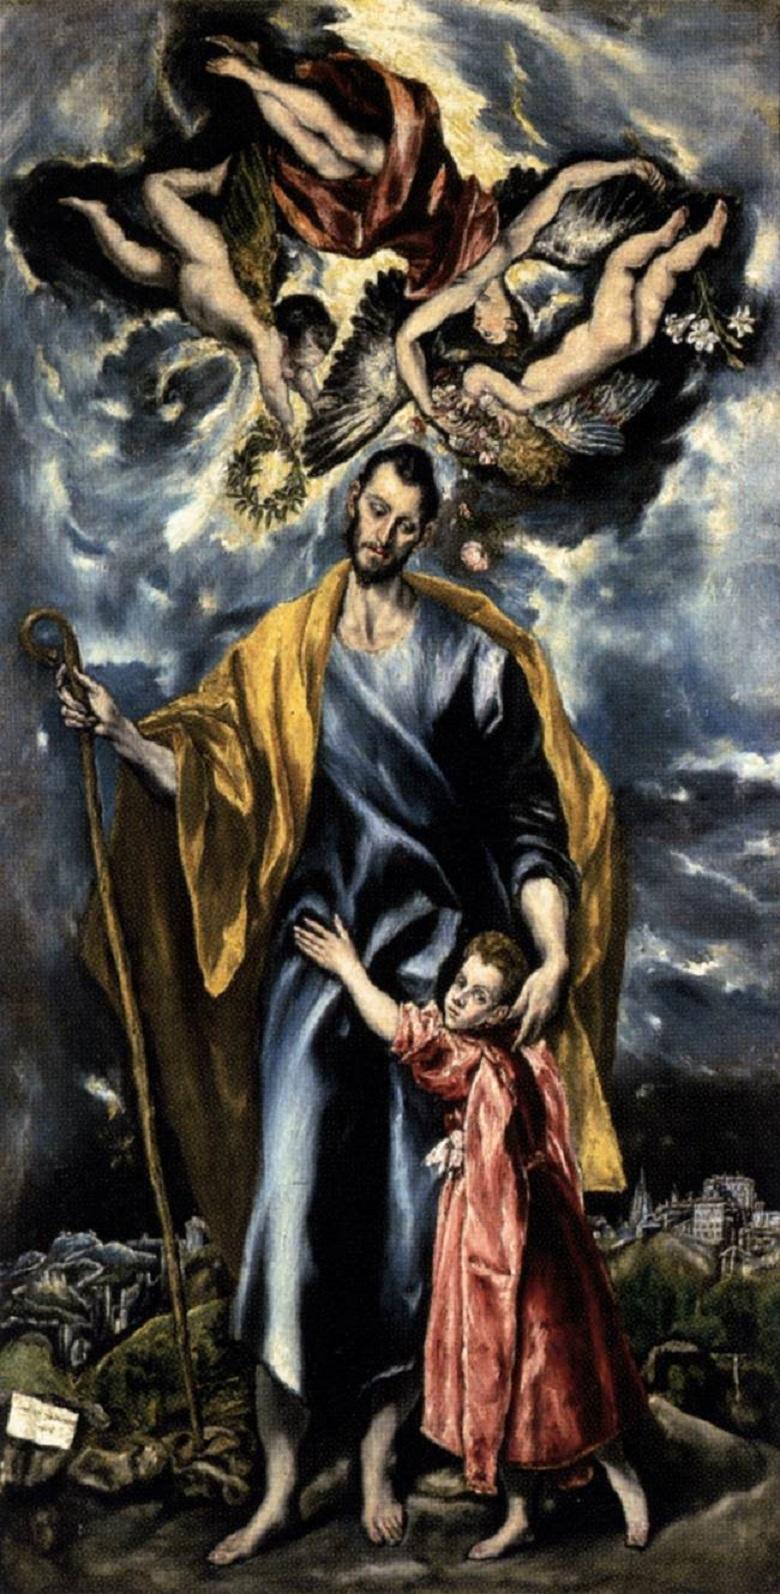 El_Greco_St_Joseph_and_the_Christ_Child_1597-99